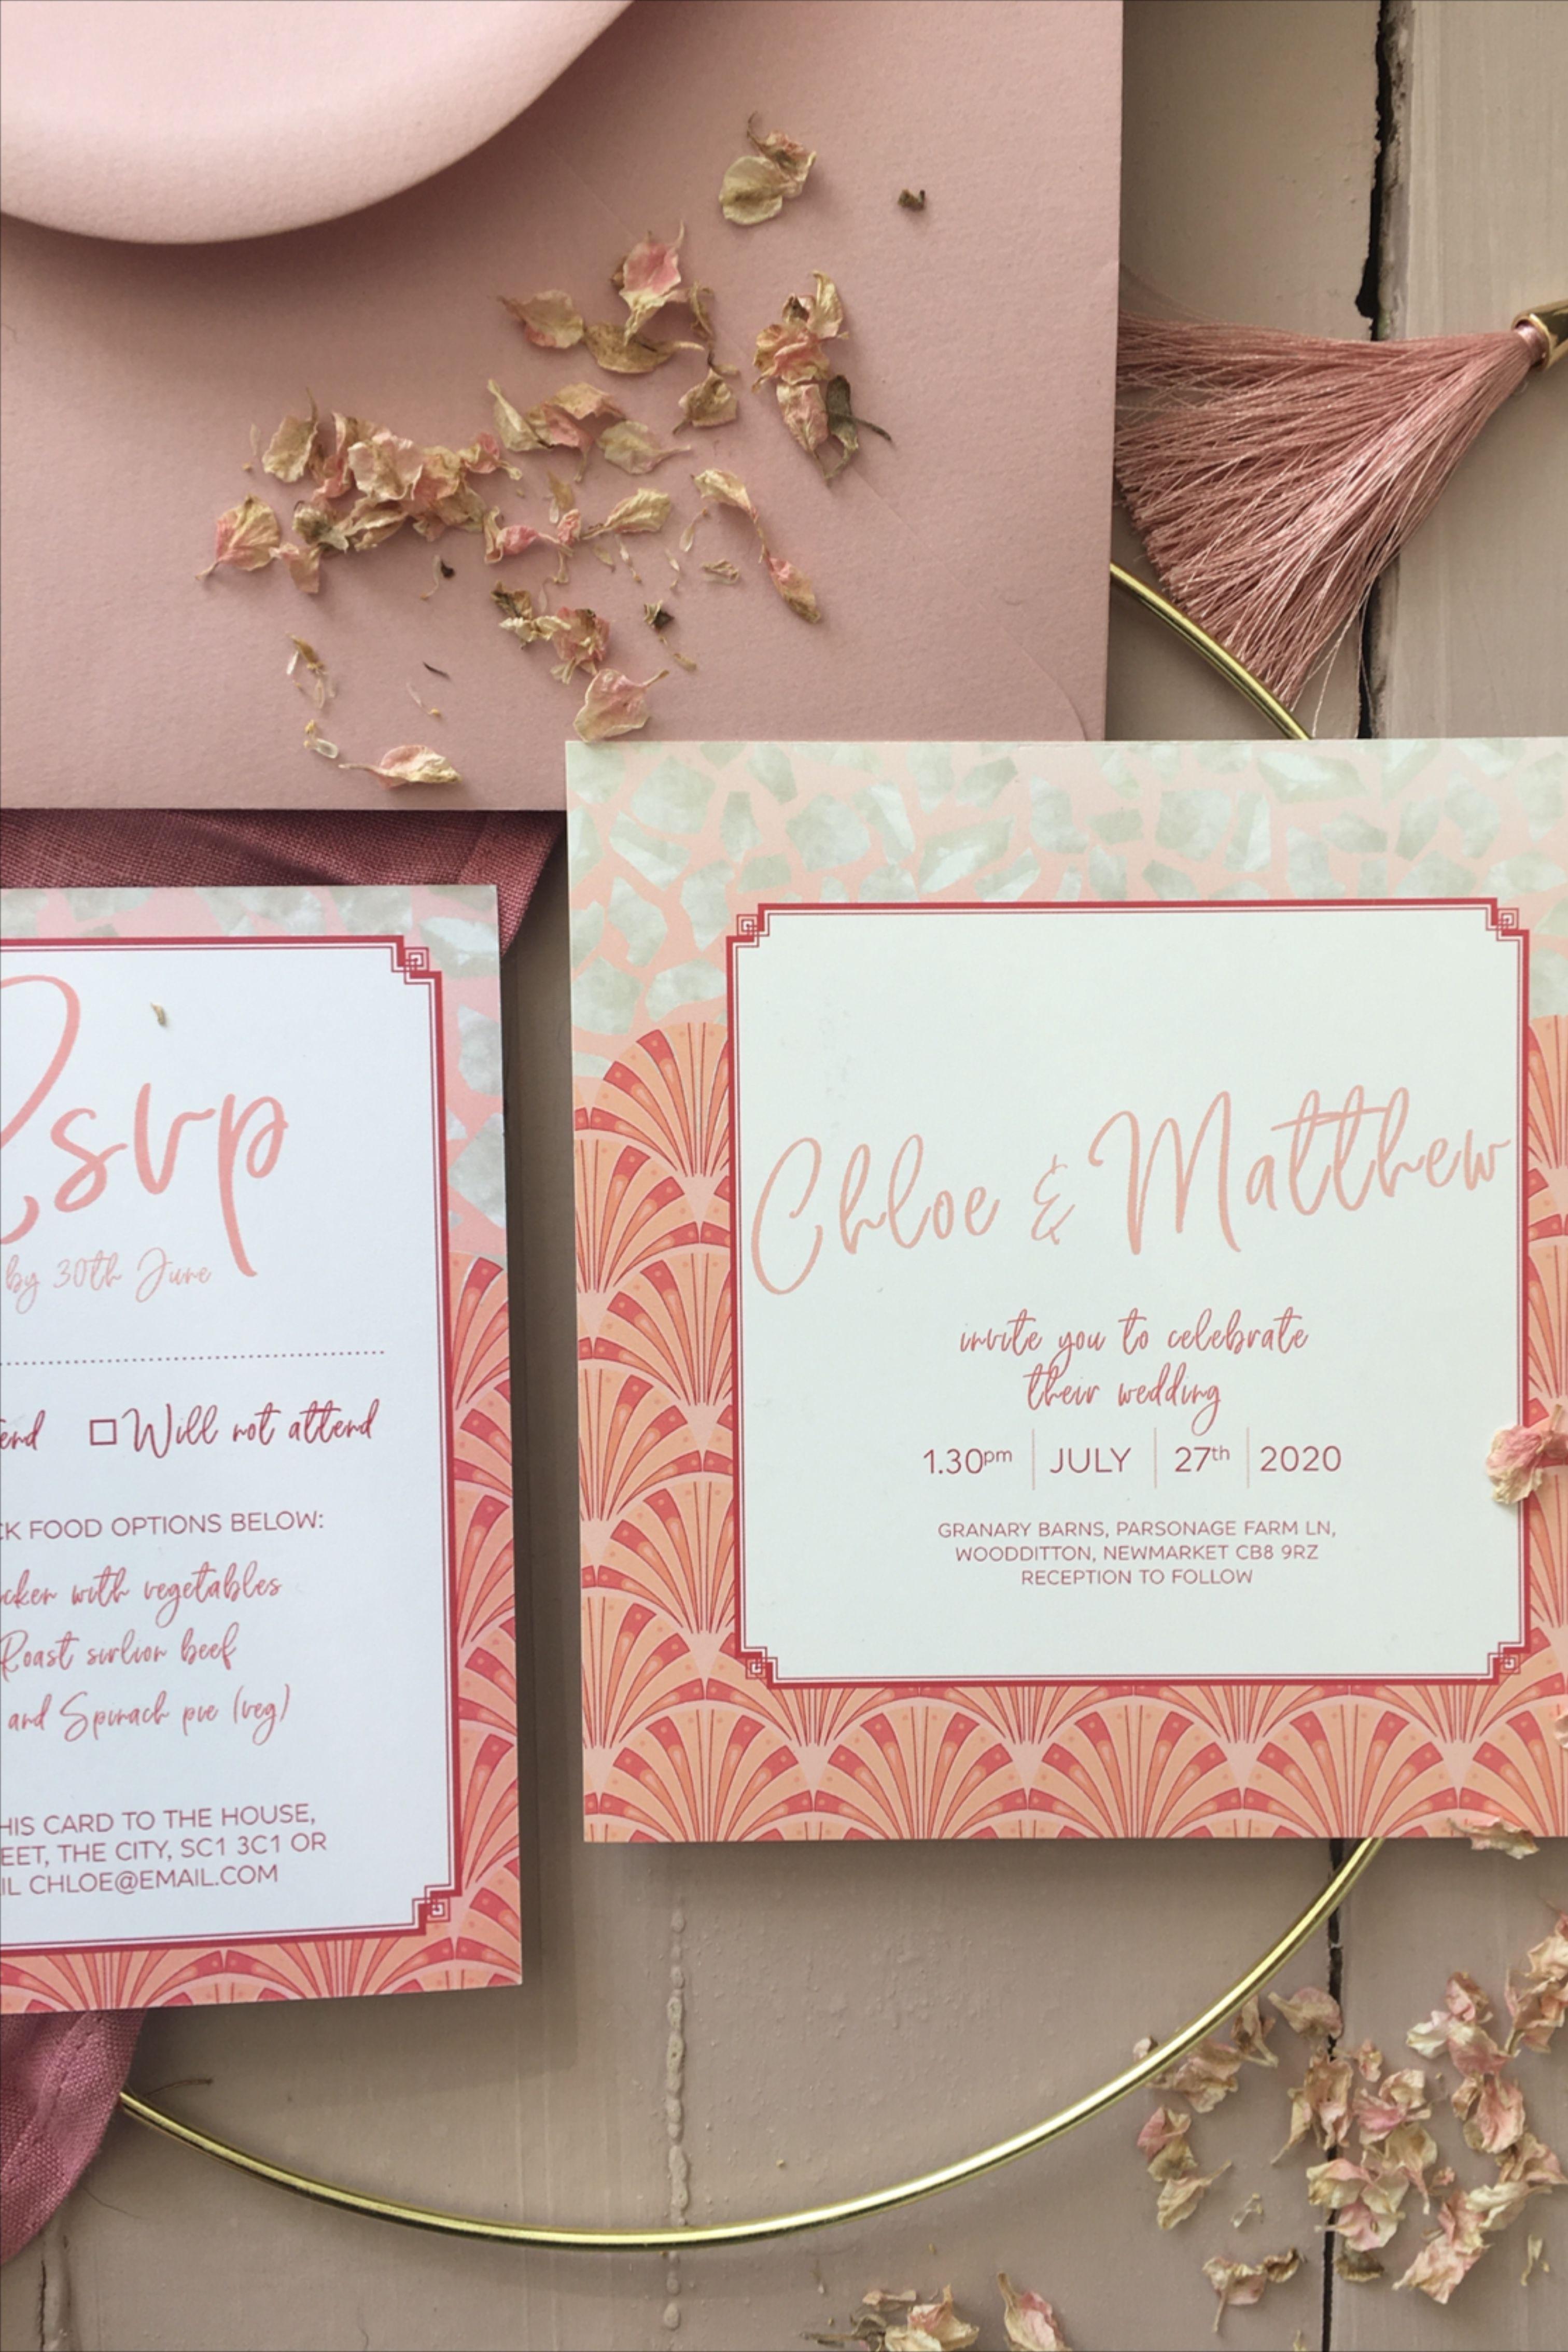 Vintage Art Deco Wedding Invitations In 2020 Pearl Wedding Invitations Square Wedding Invitations Wedding Invitations